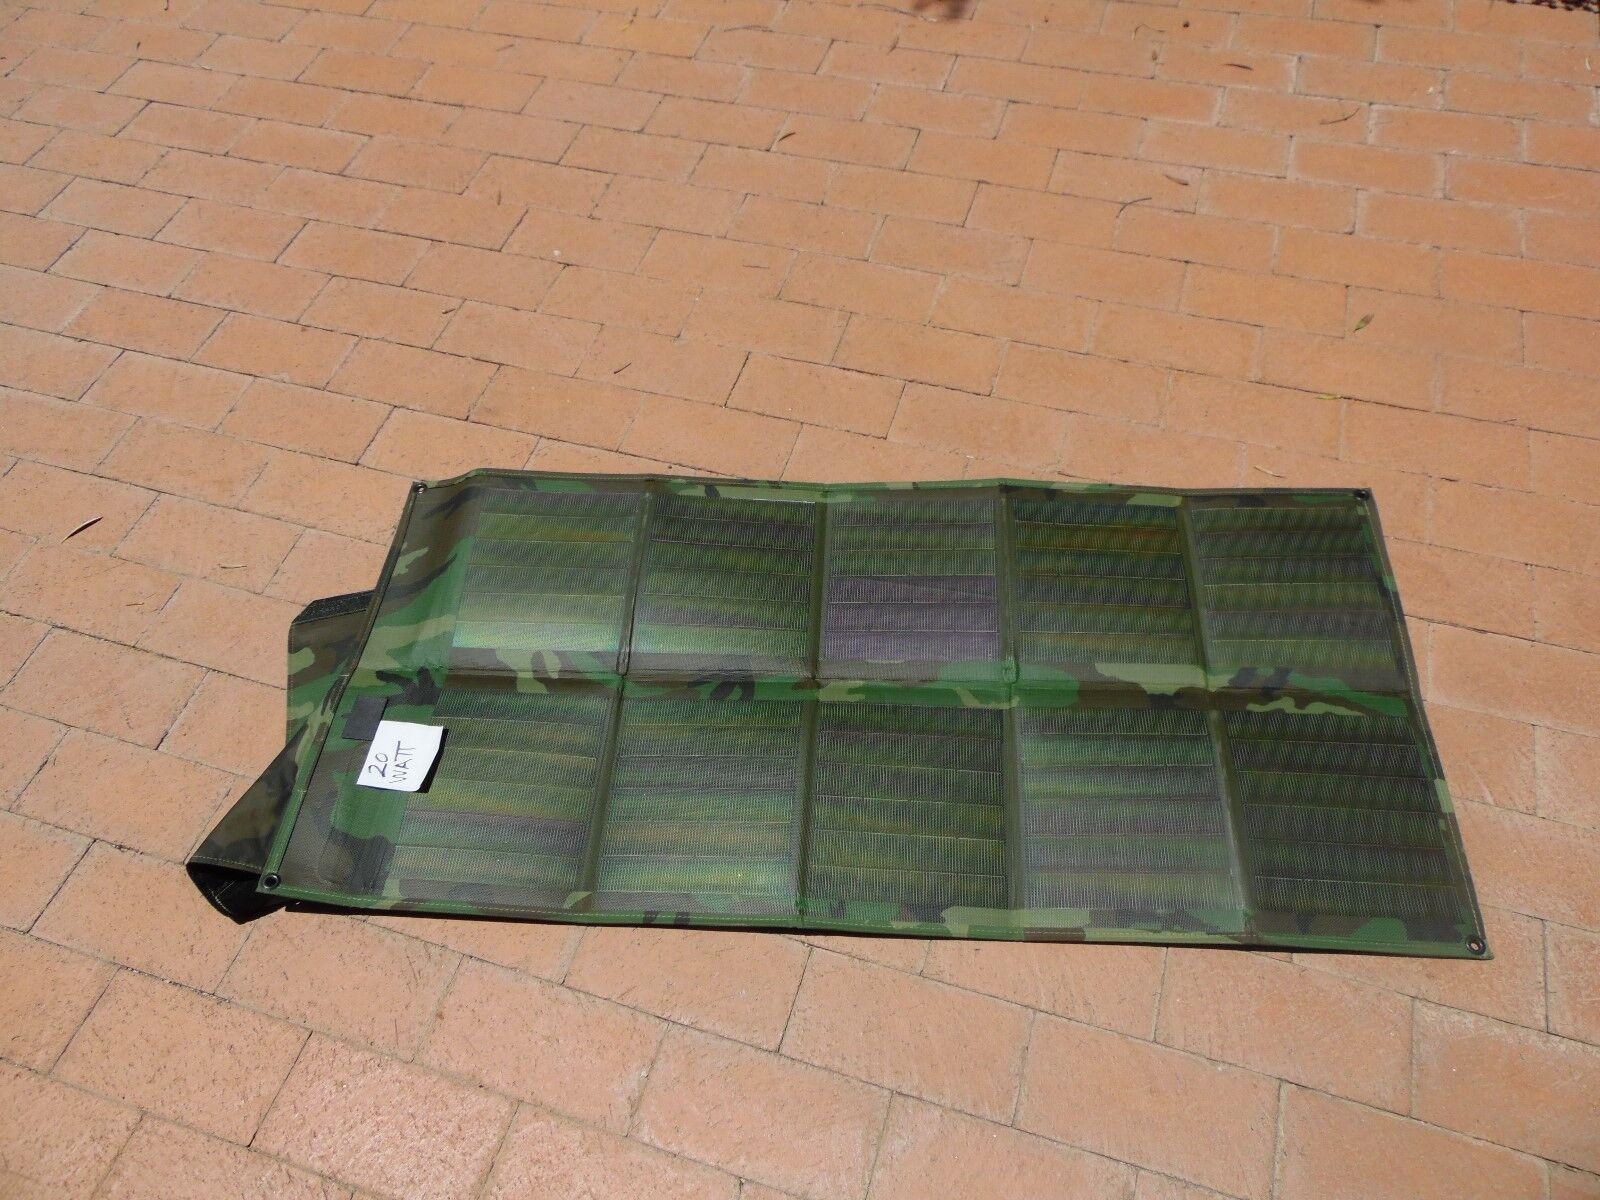 20 Watt Solar Module (w  flap) Grün - Free shipping  BEST OFFER